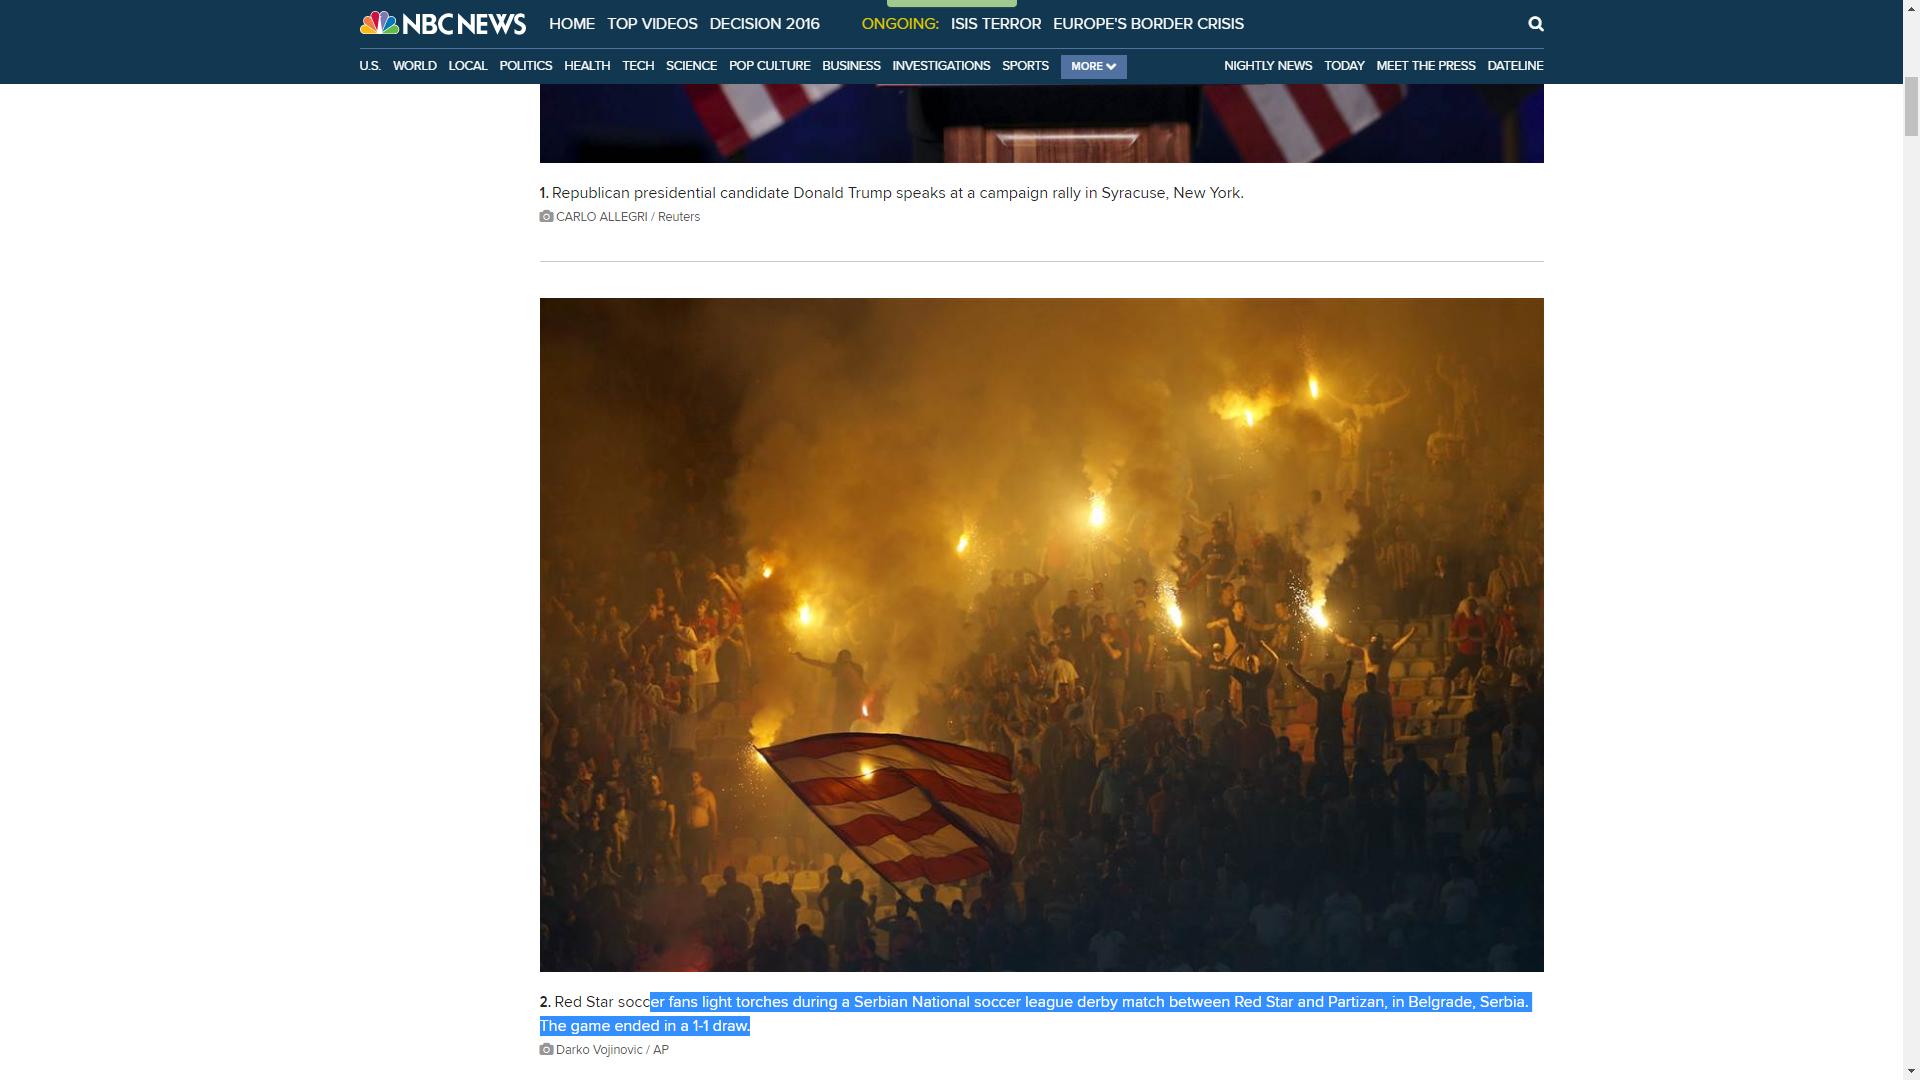 (FOTO: NBC Screenshot)